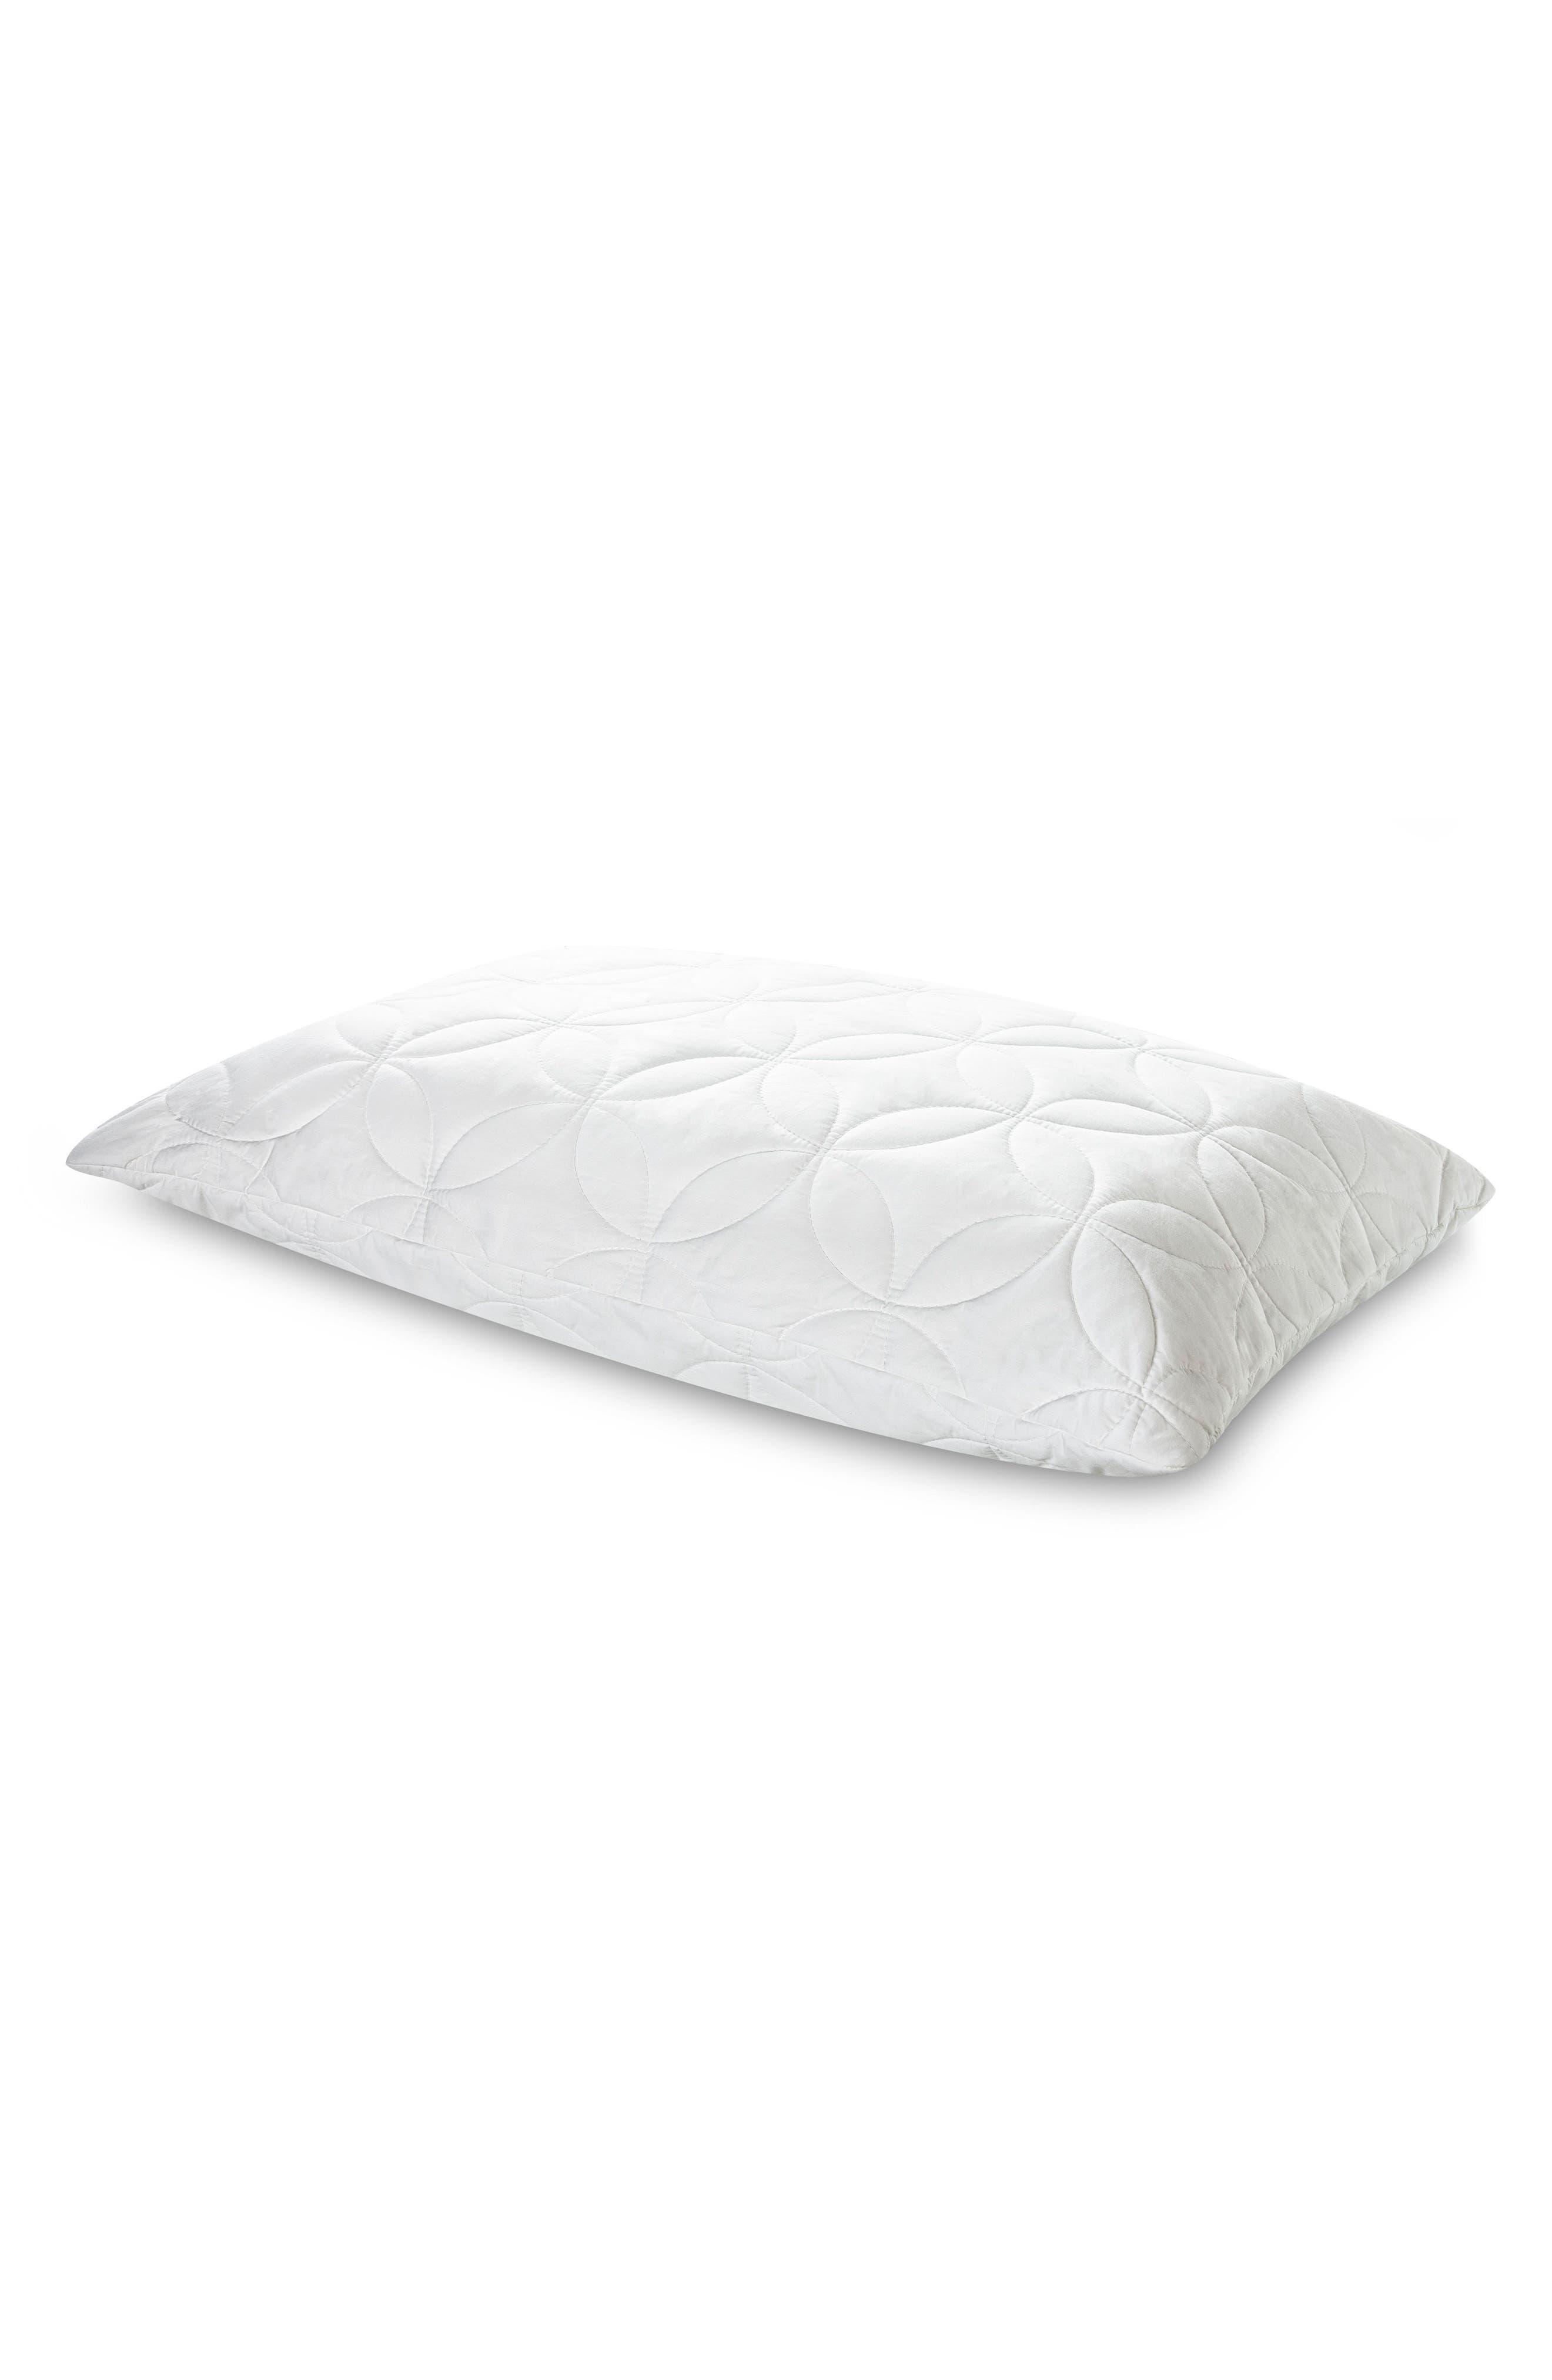 TempurPedic Bed Pillows Bedding Nordstrom